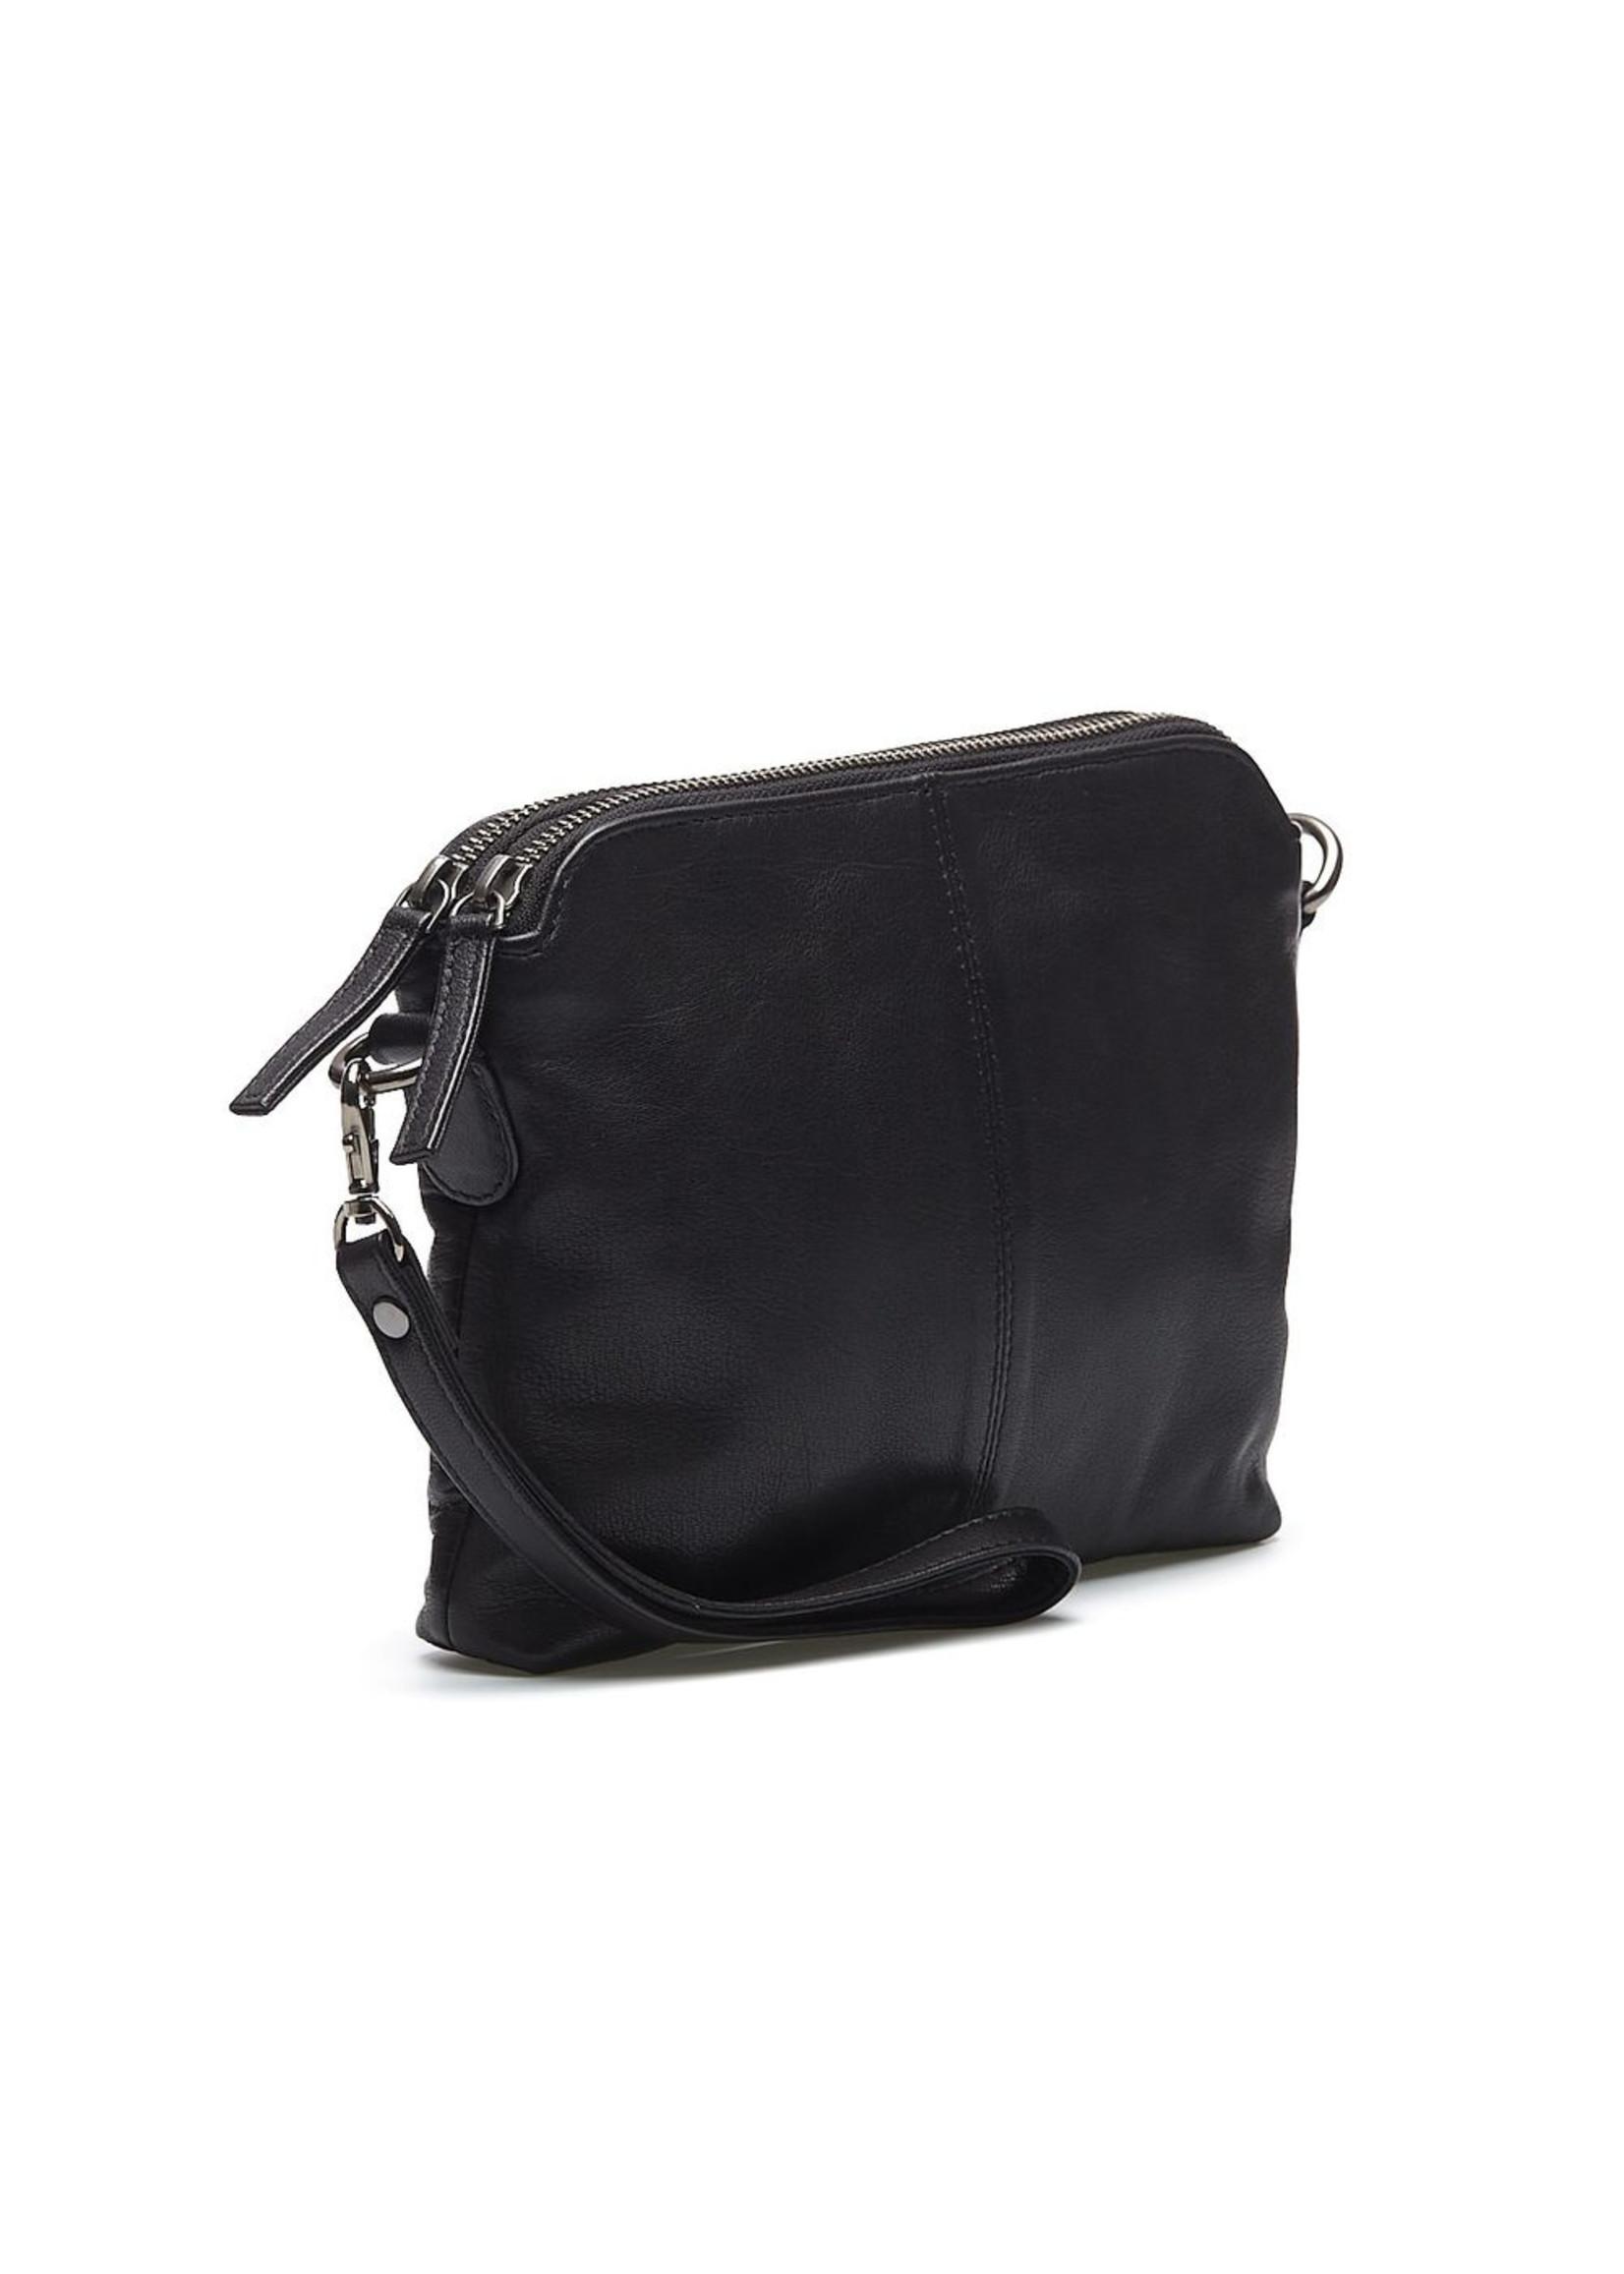 Chabo Bags Bardot Crossover tas Zwart